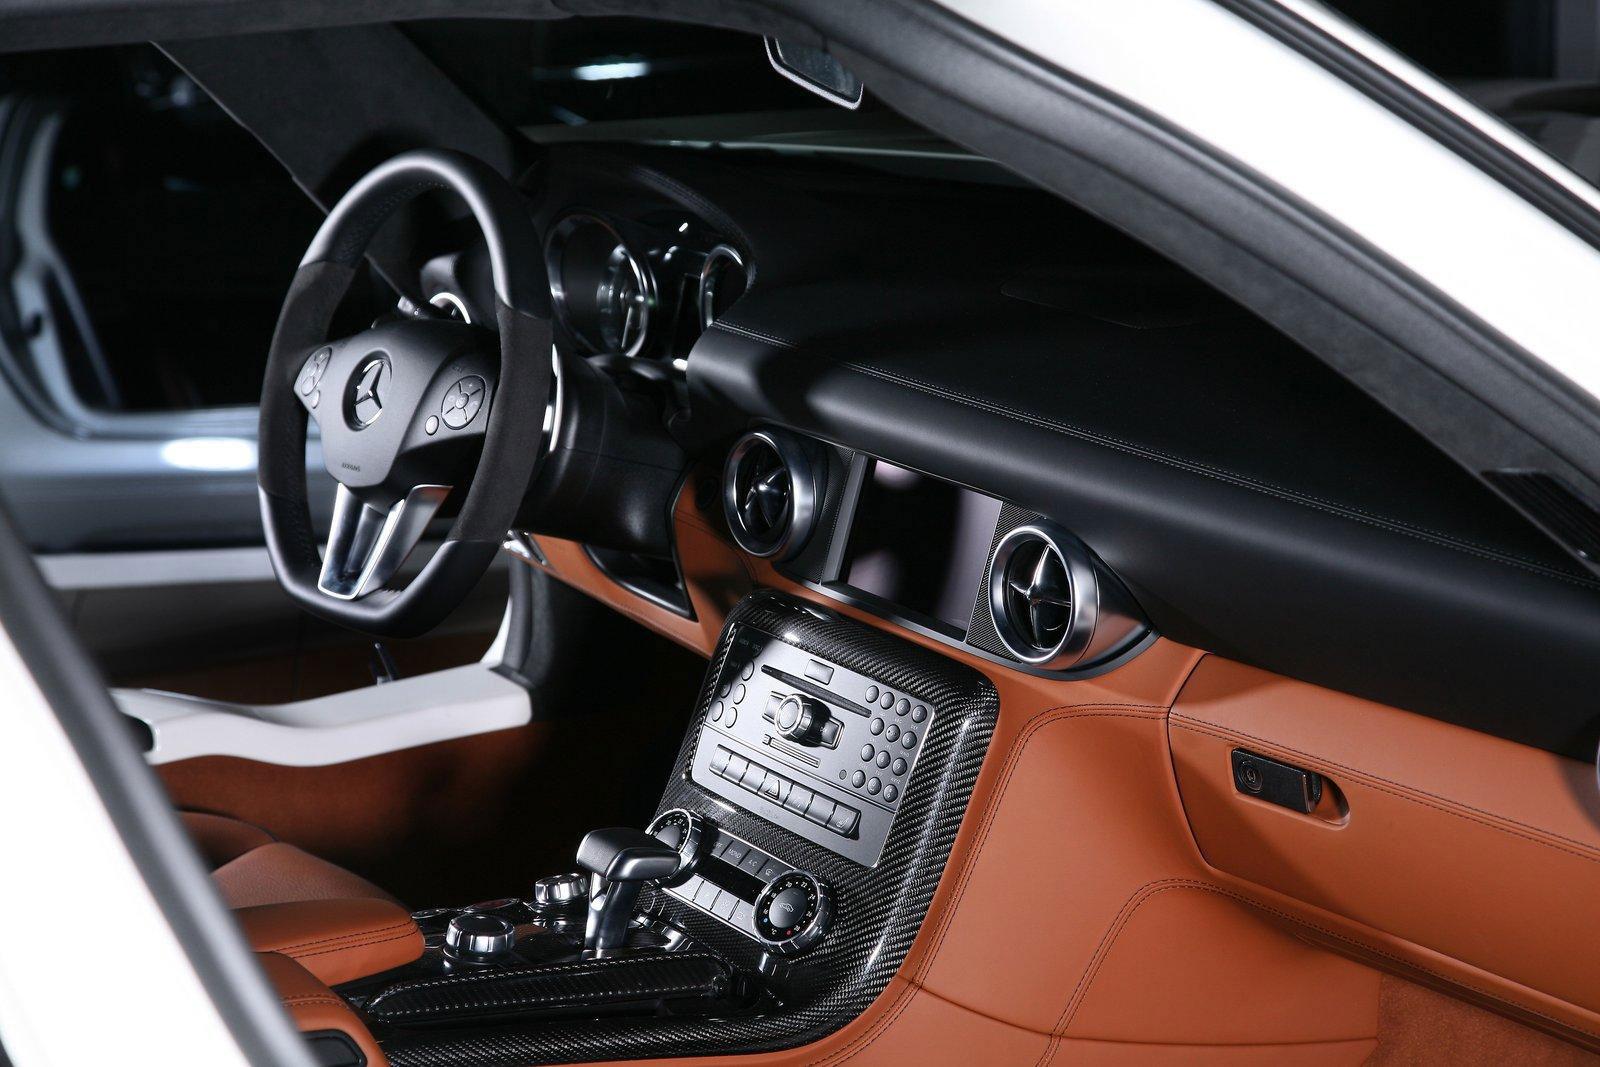 Mercedes-Benz SLS AMG dostal od Inden Design pár koní navíc 6